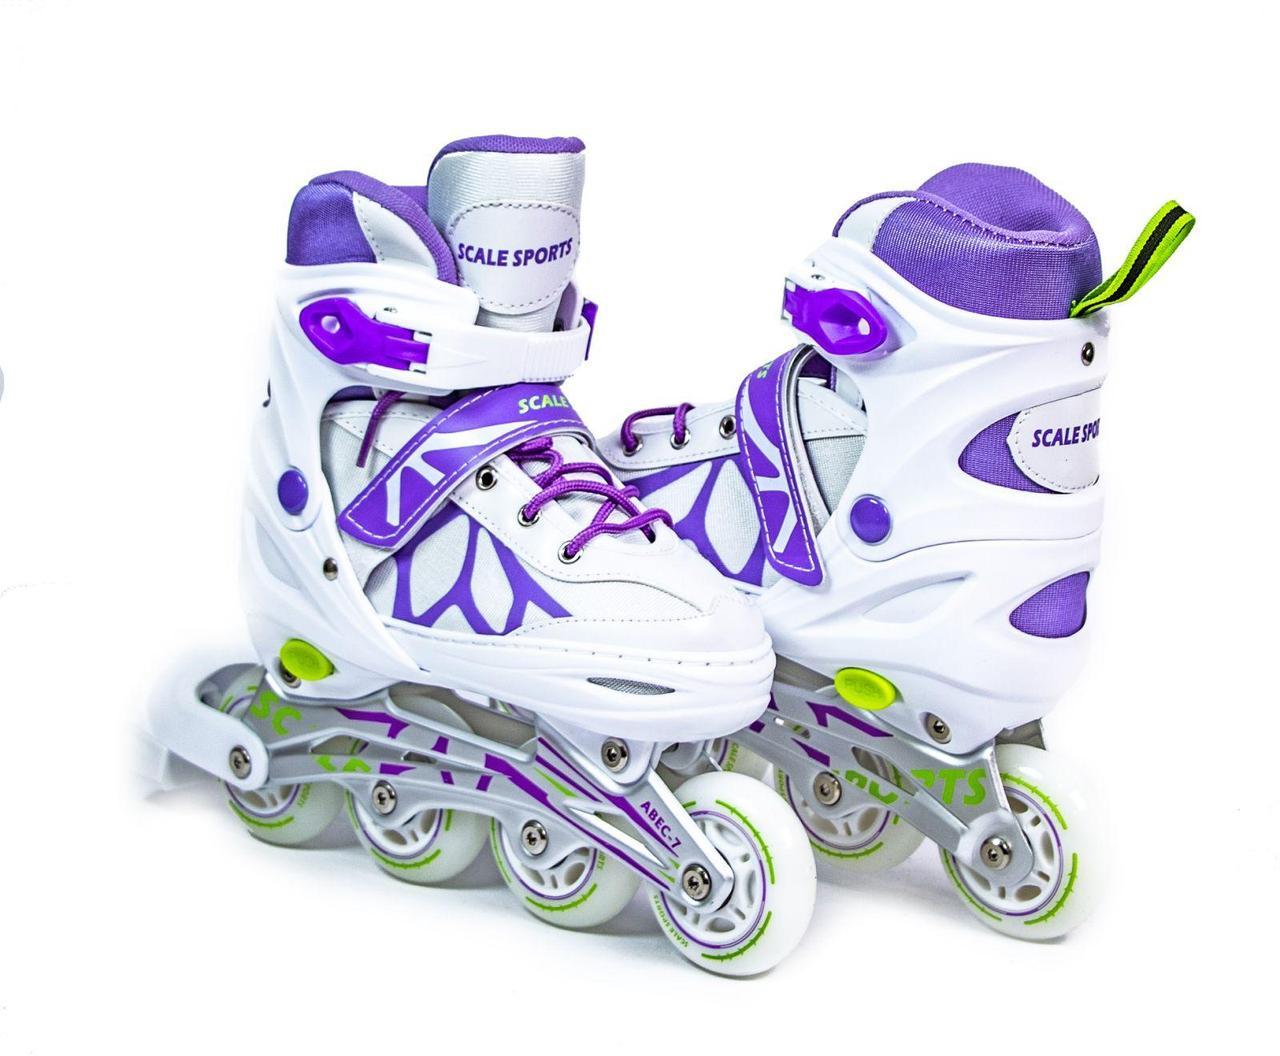 Деткие ролики Scale Sports LF 601A бело-фиолетовые, размер 29-33 LF 601A-S-1